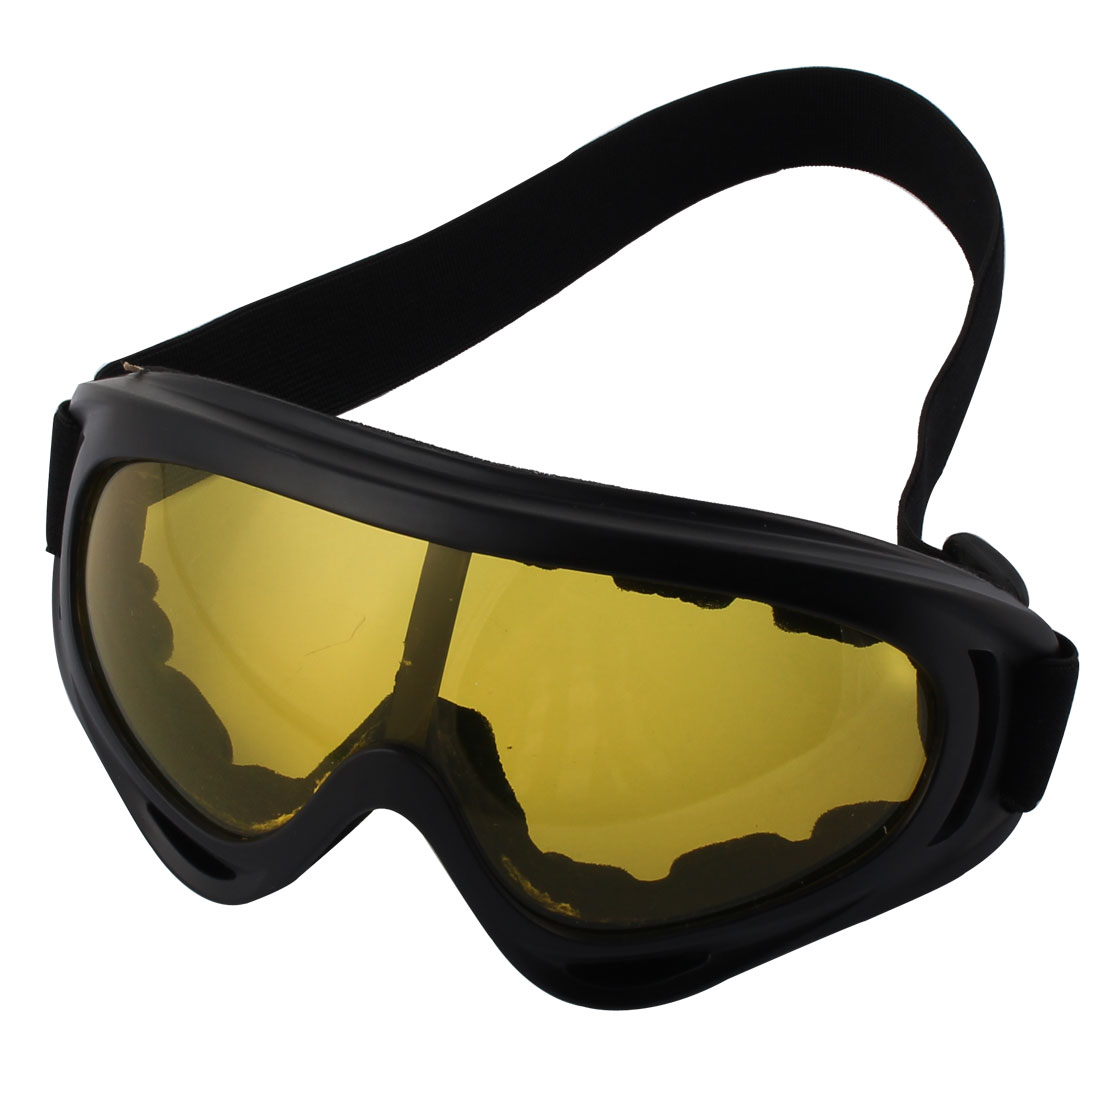 Outdoor Skiing Plastic Frame Anti-Snow Chrome Eye Protector Tinted Lens Ski Eyeglass